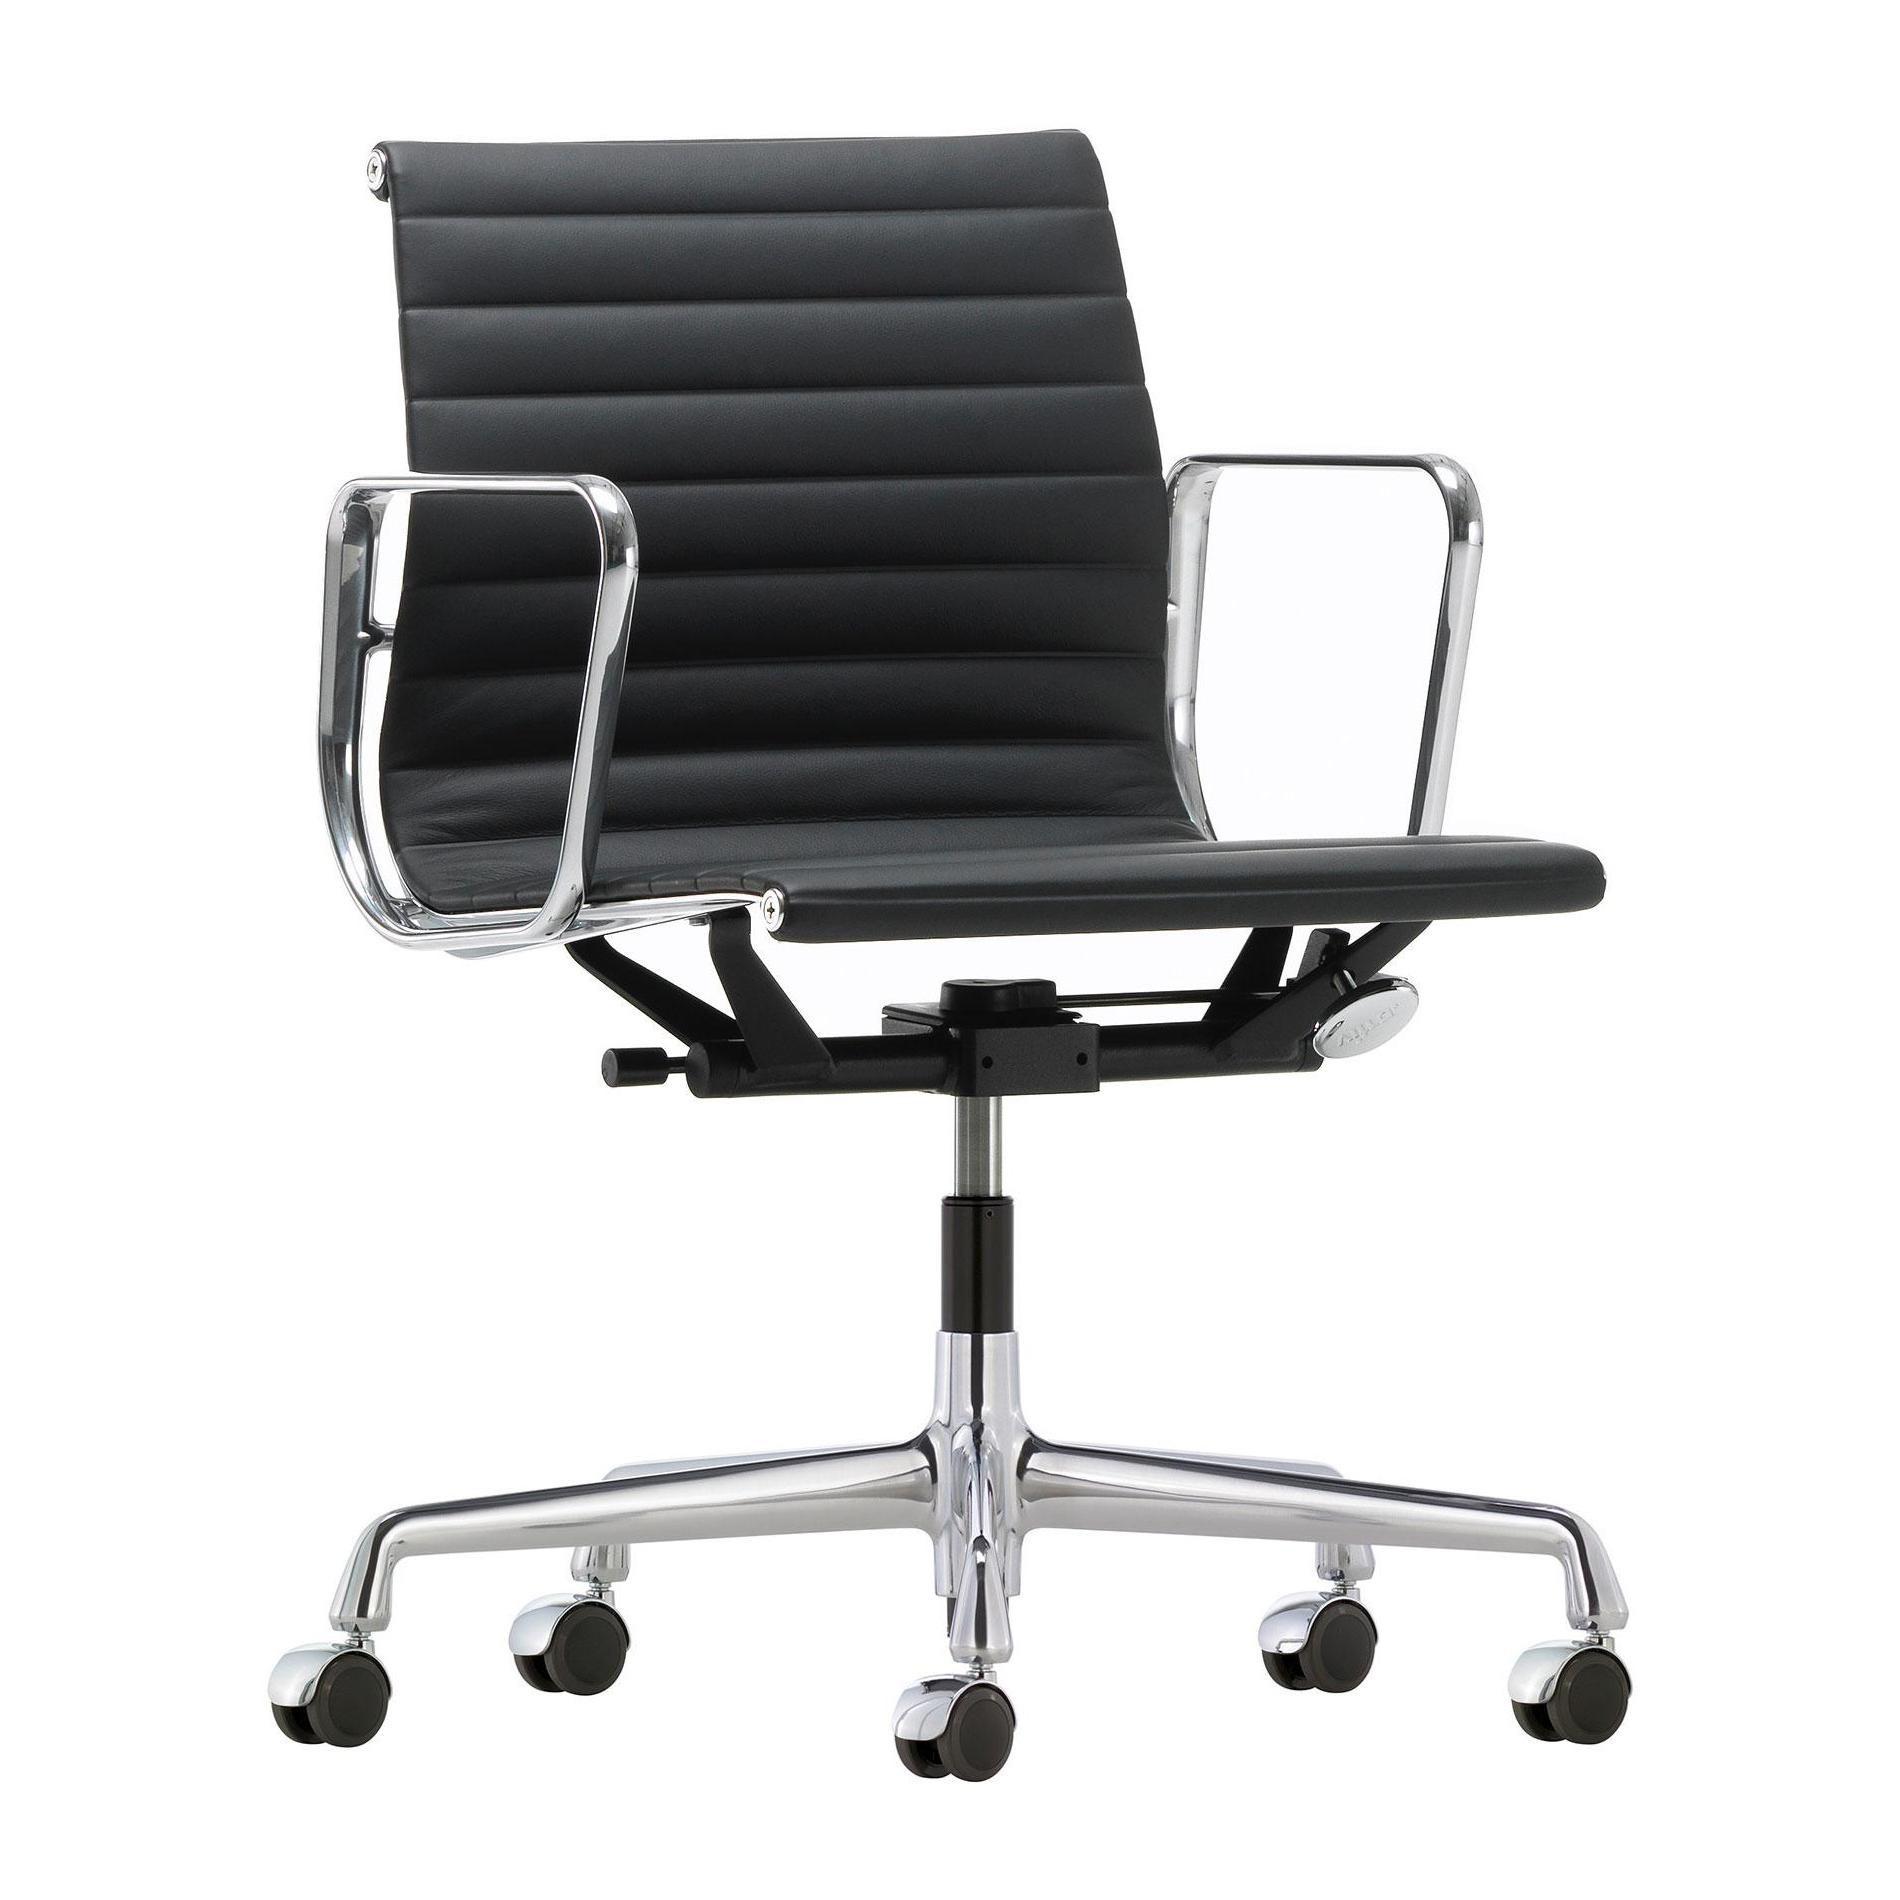 Vitra ea 117 alu chair b rostuhl gestell verchromt for Ea 117 nachbau